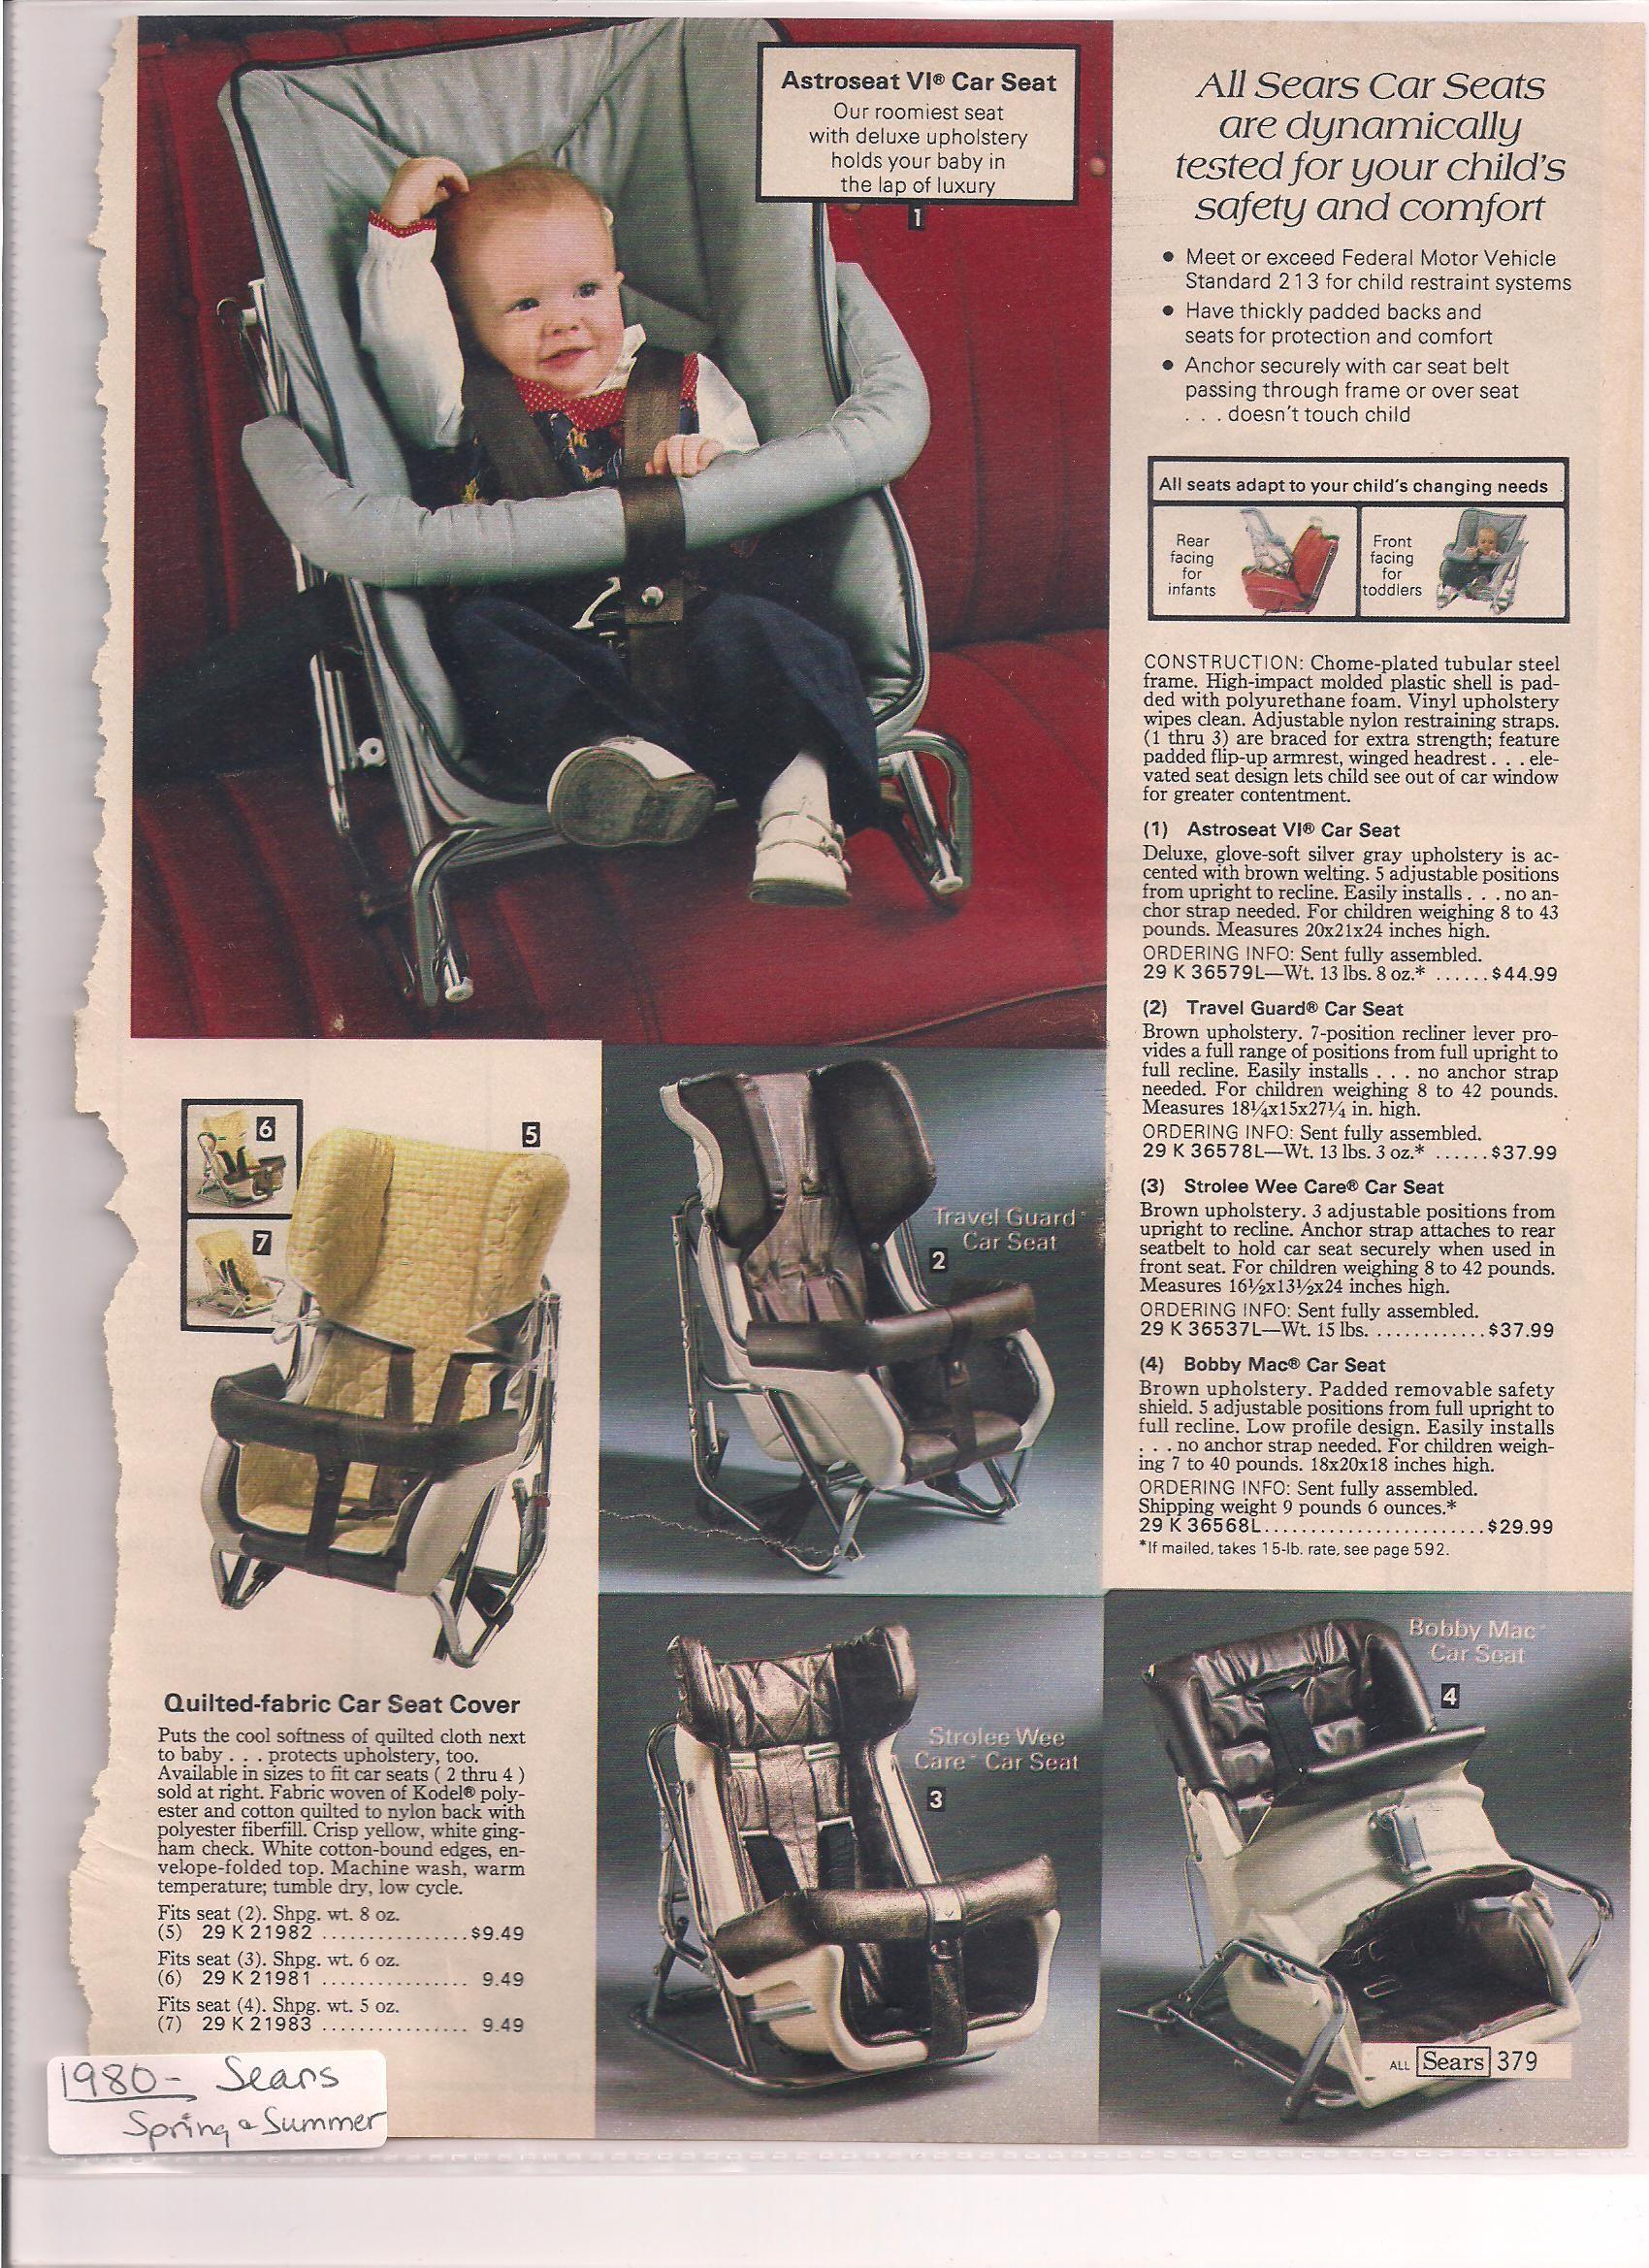 Pin on Vintage car seats